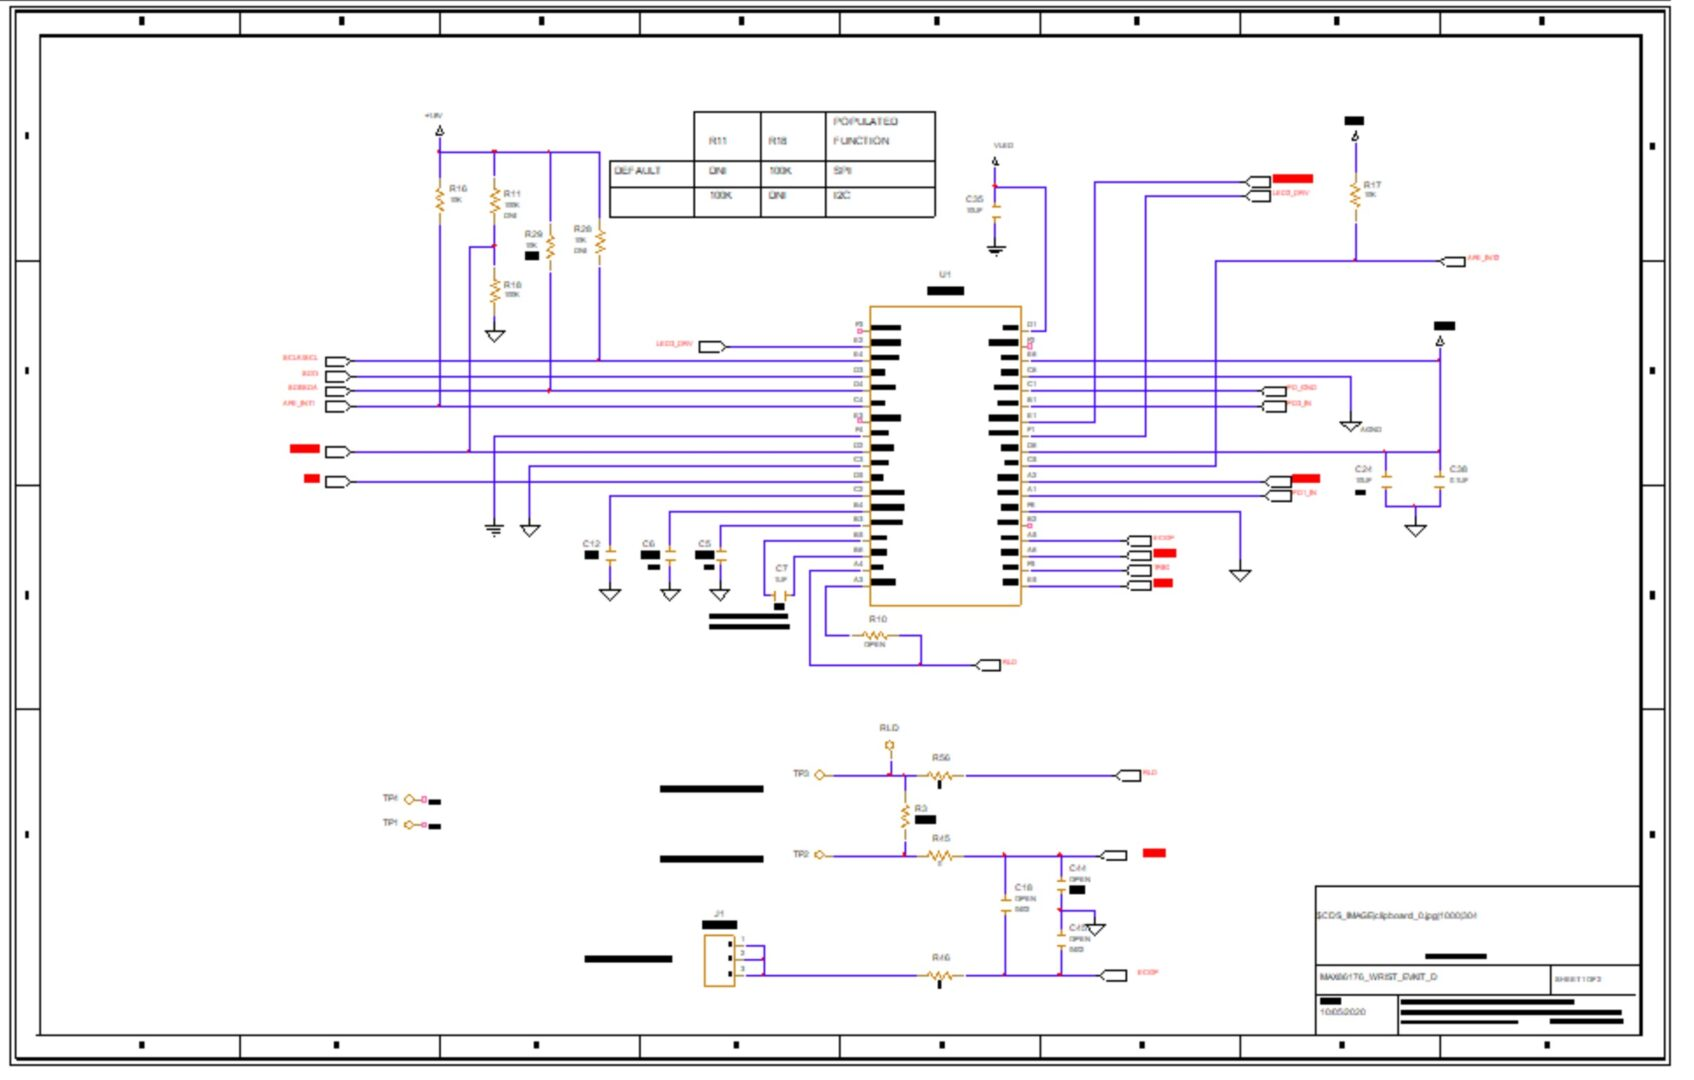 Reference Design Schematic